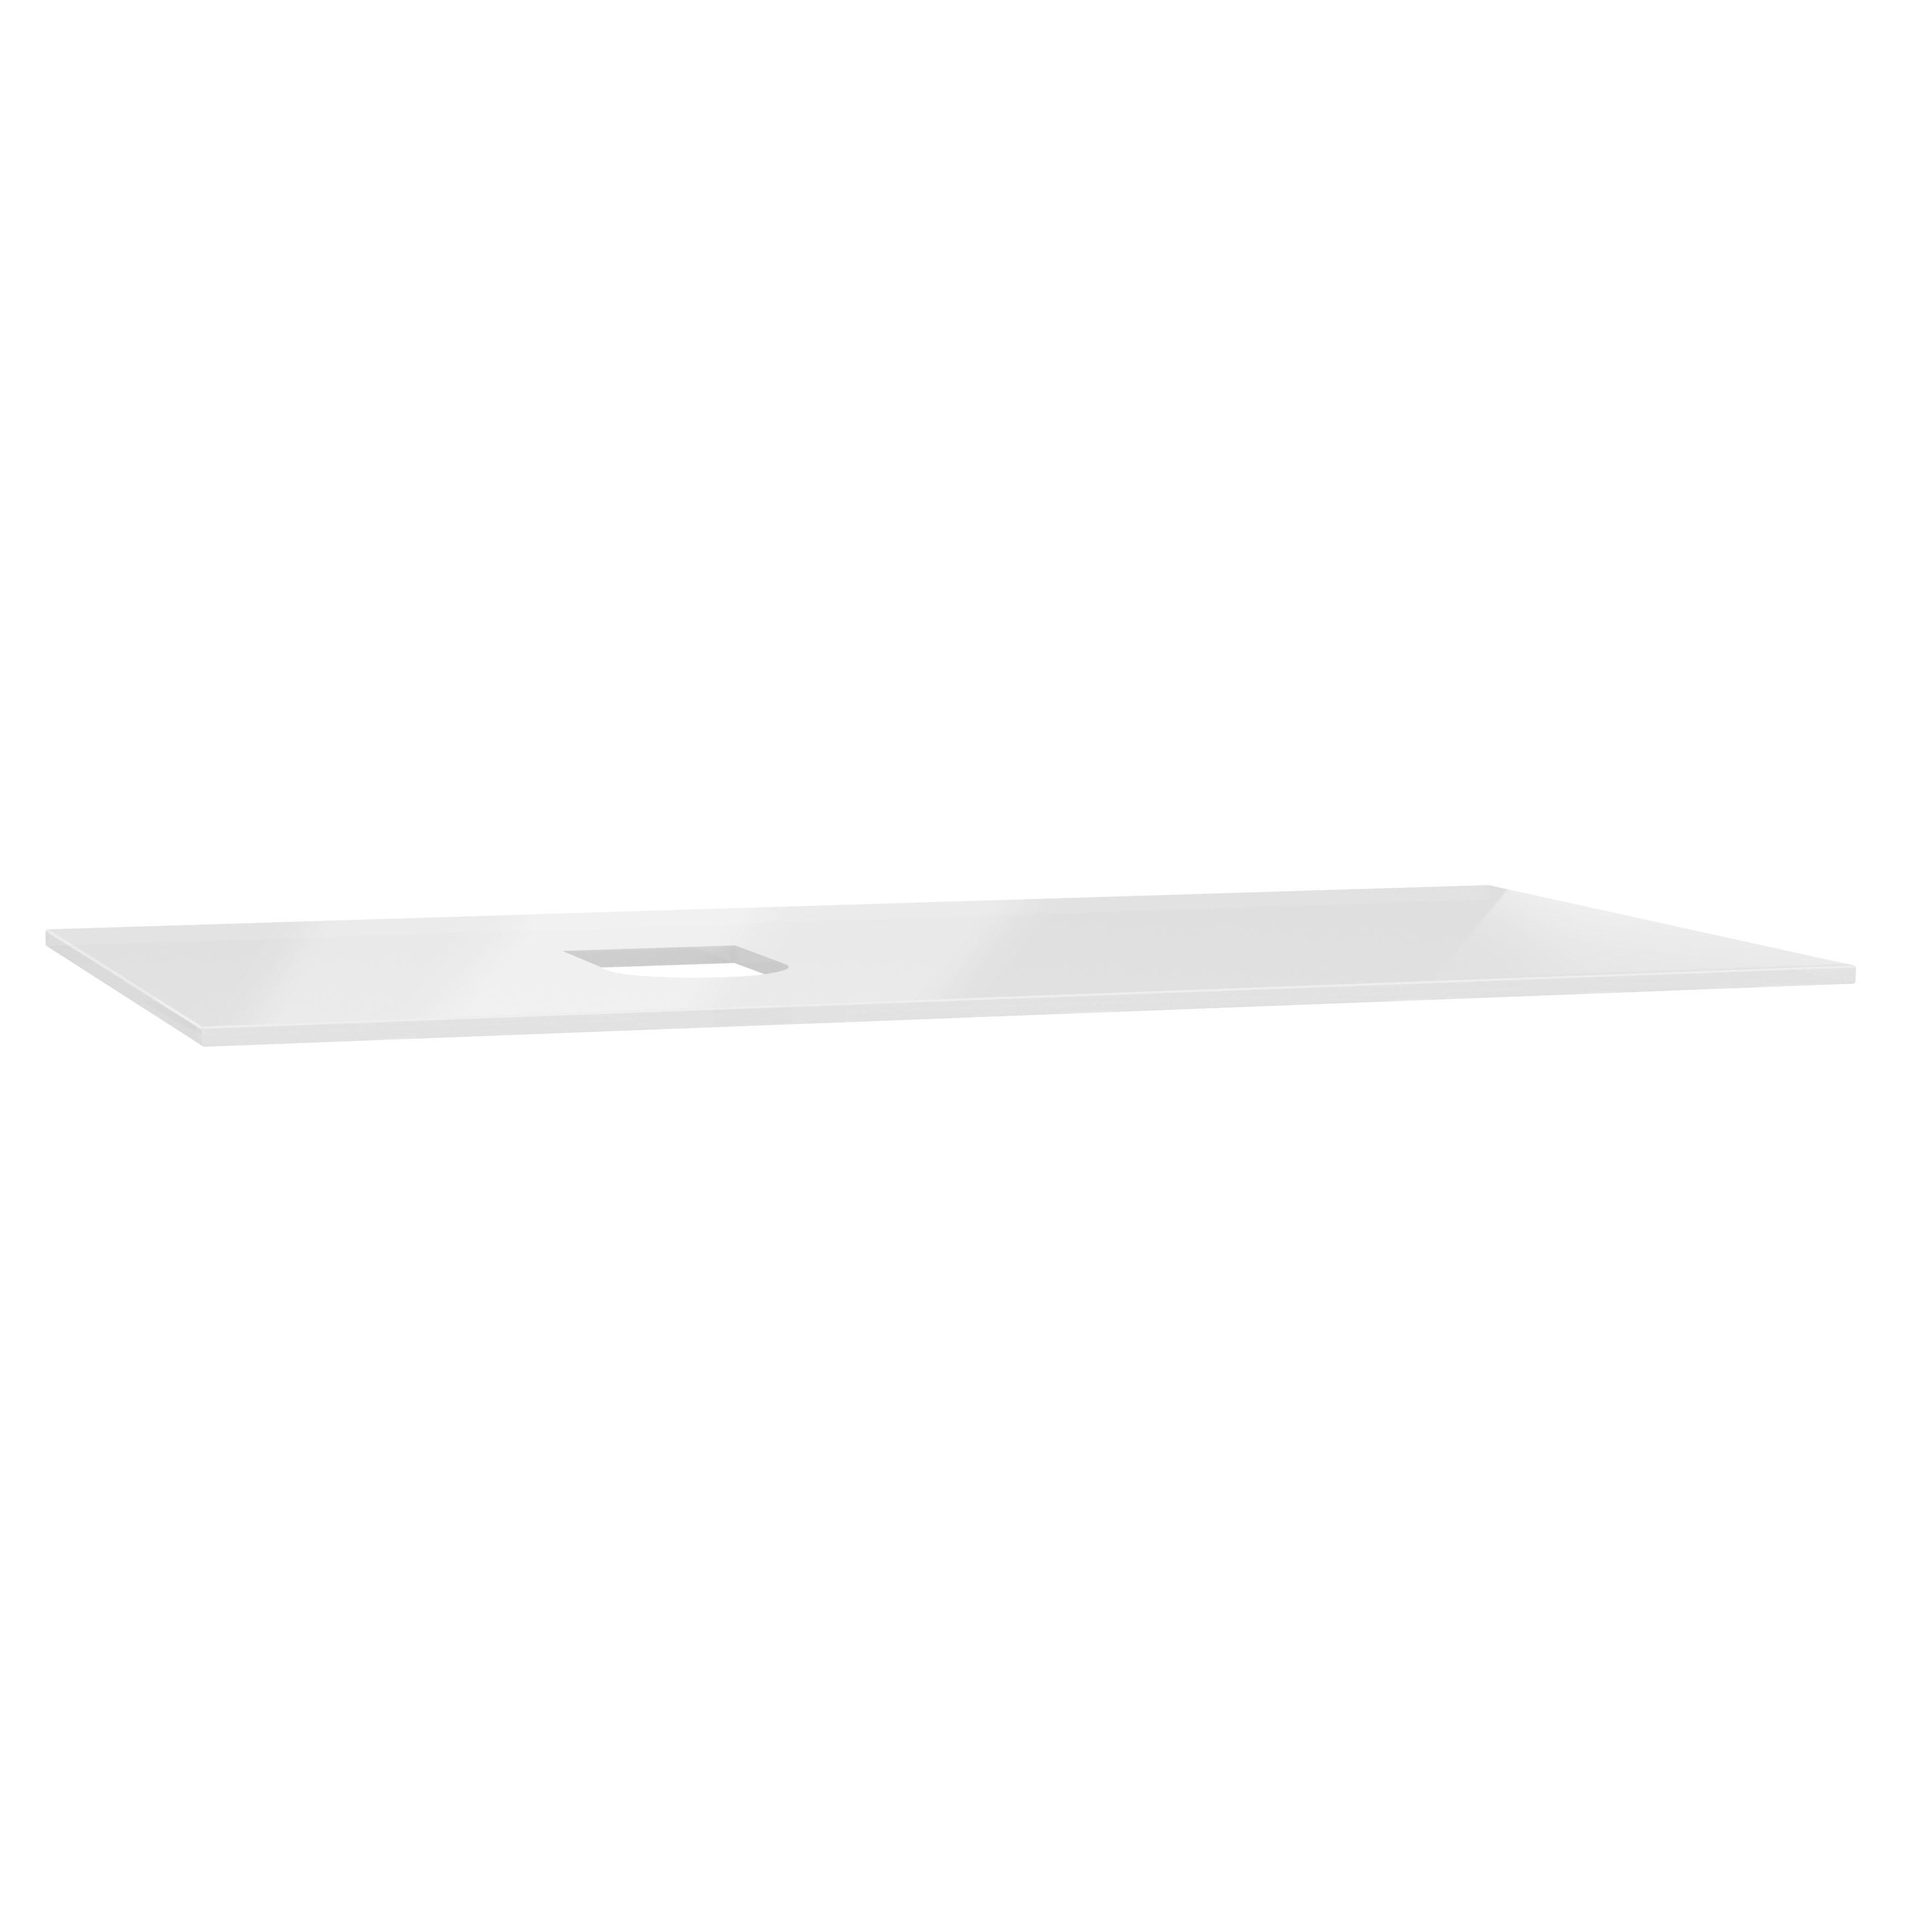 Origin plan de toilette, 90 cm, verre blanc, gauche